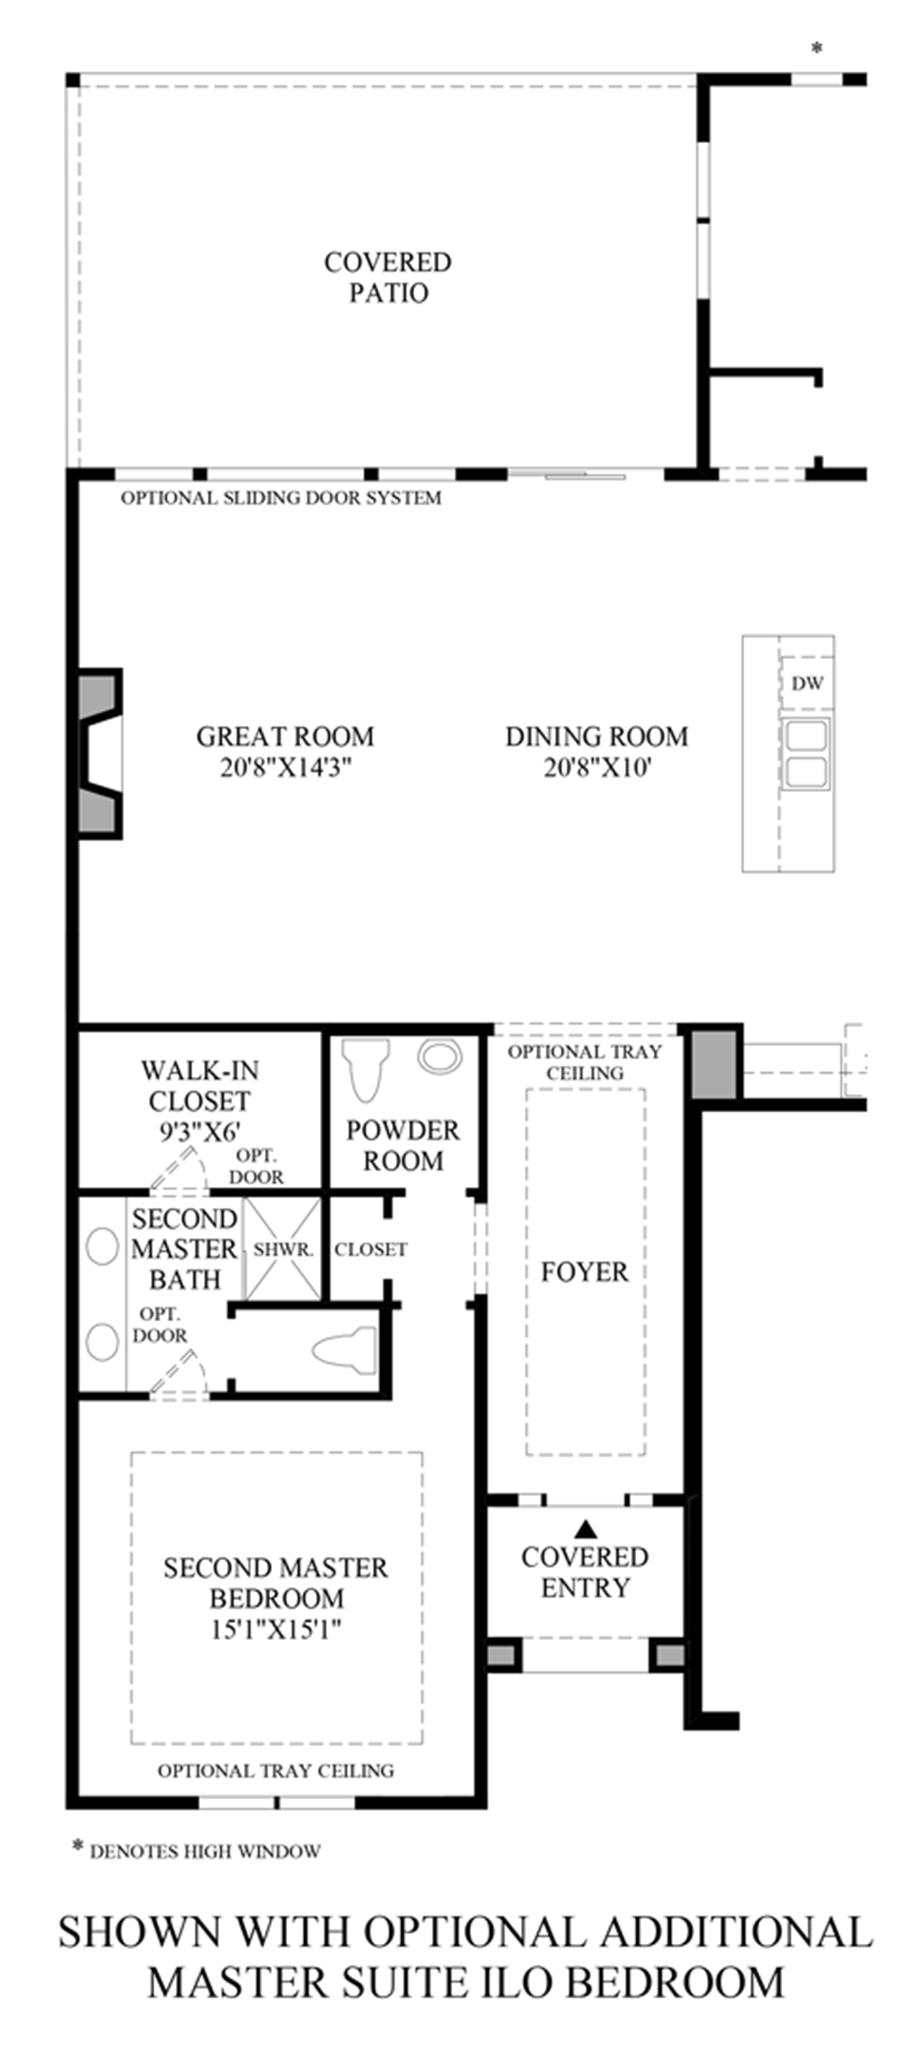 Optional Additional Master Suite ILO Bedroom Floor Plan